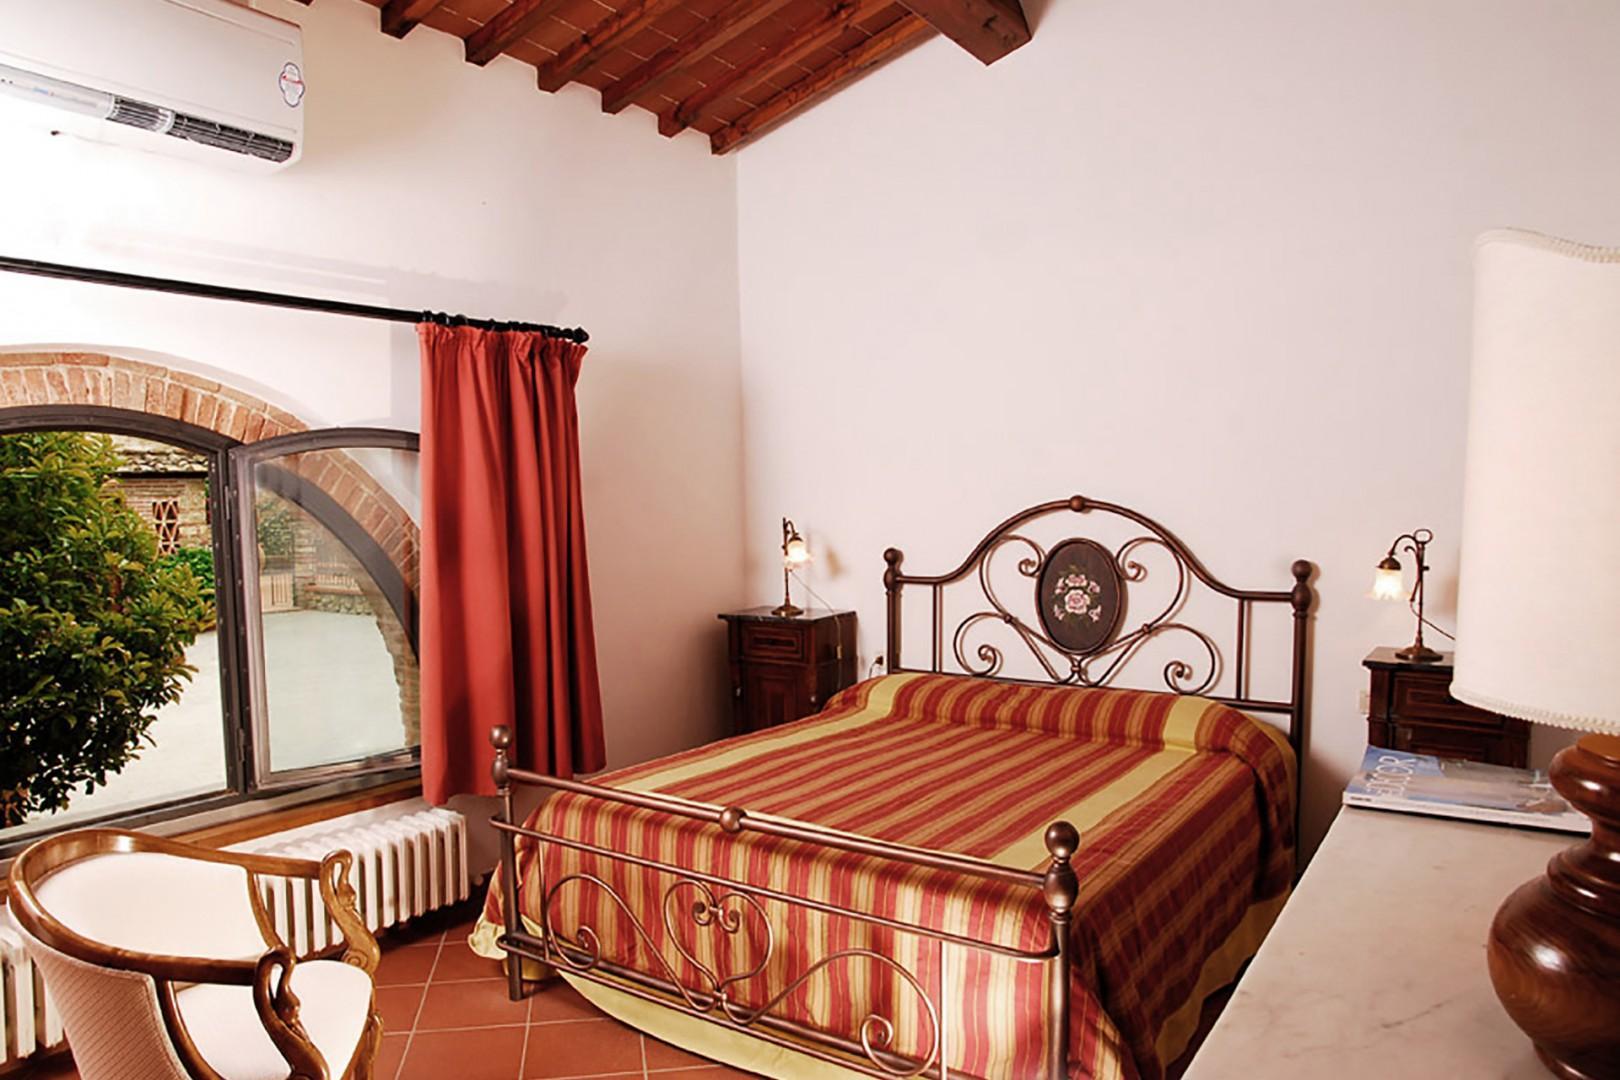 Bedroom 1 in Limonaia Villa.